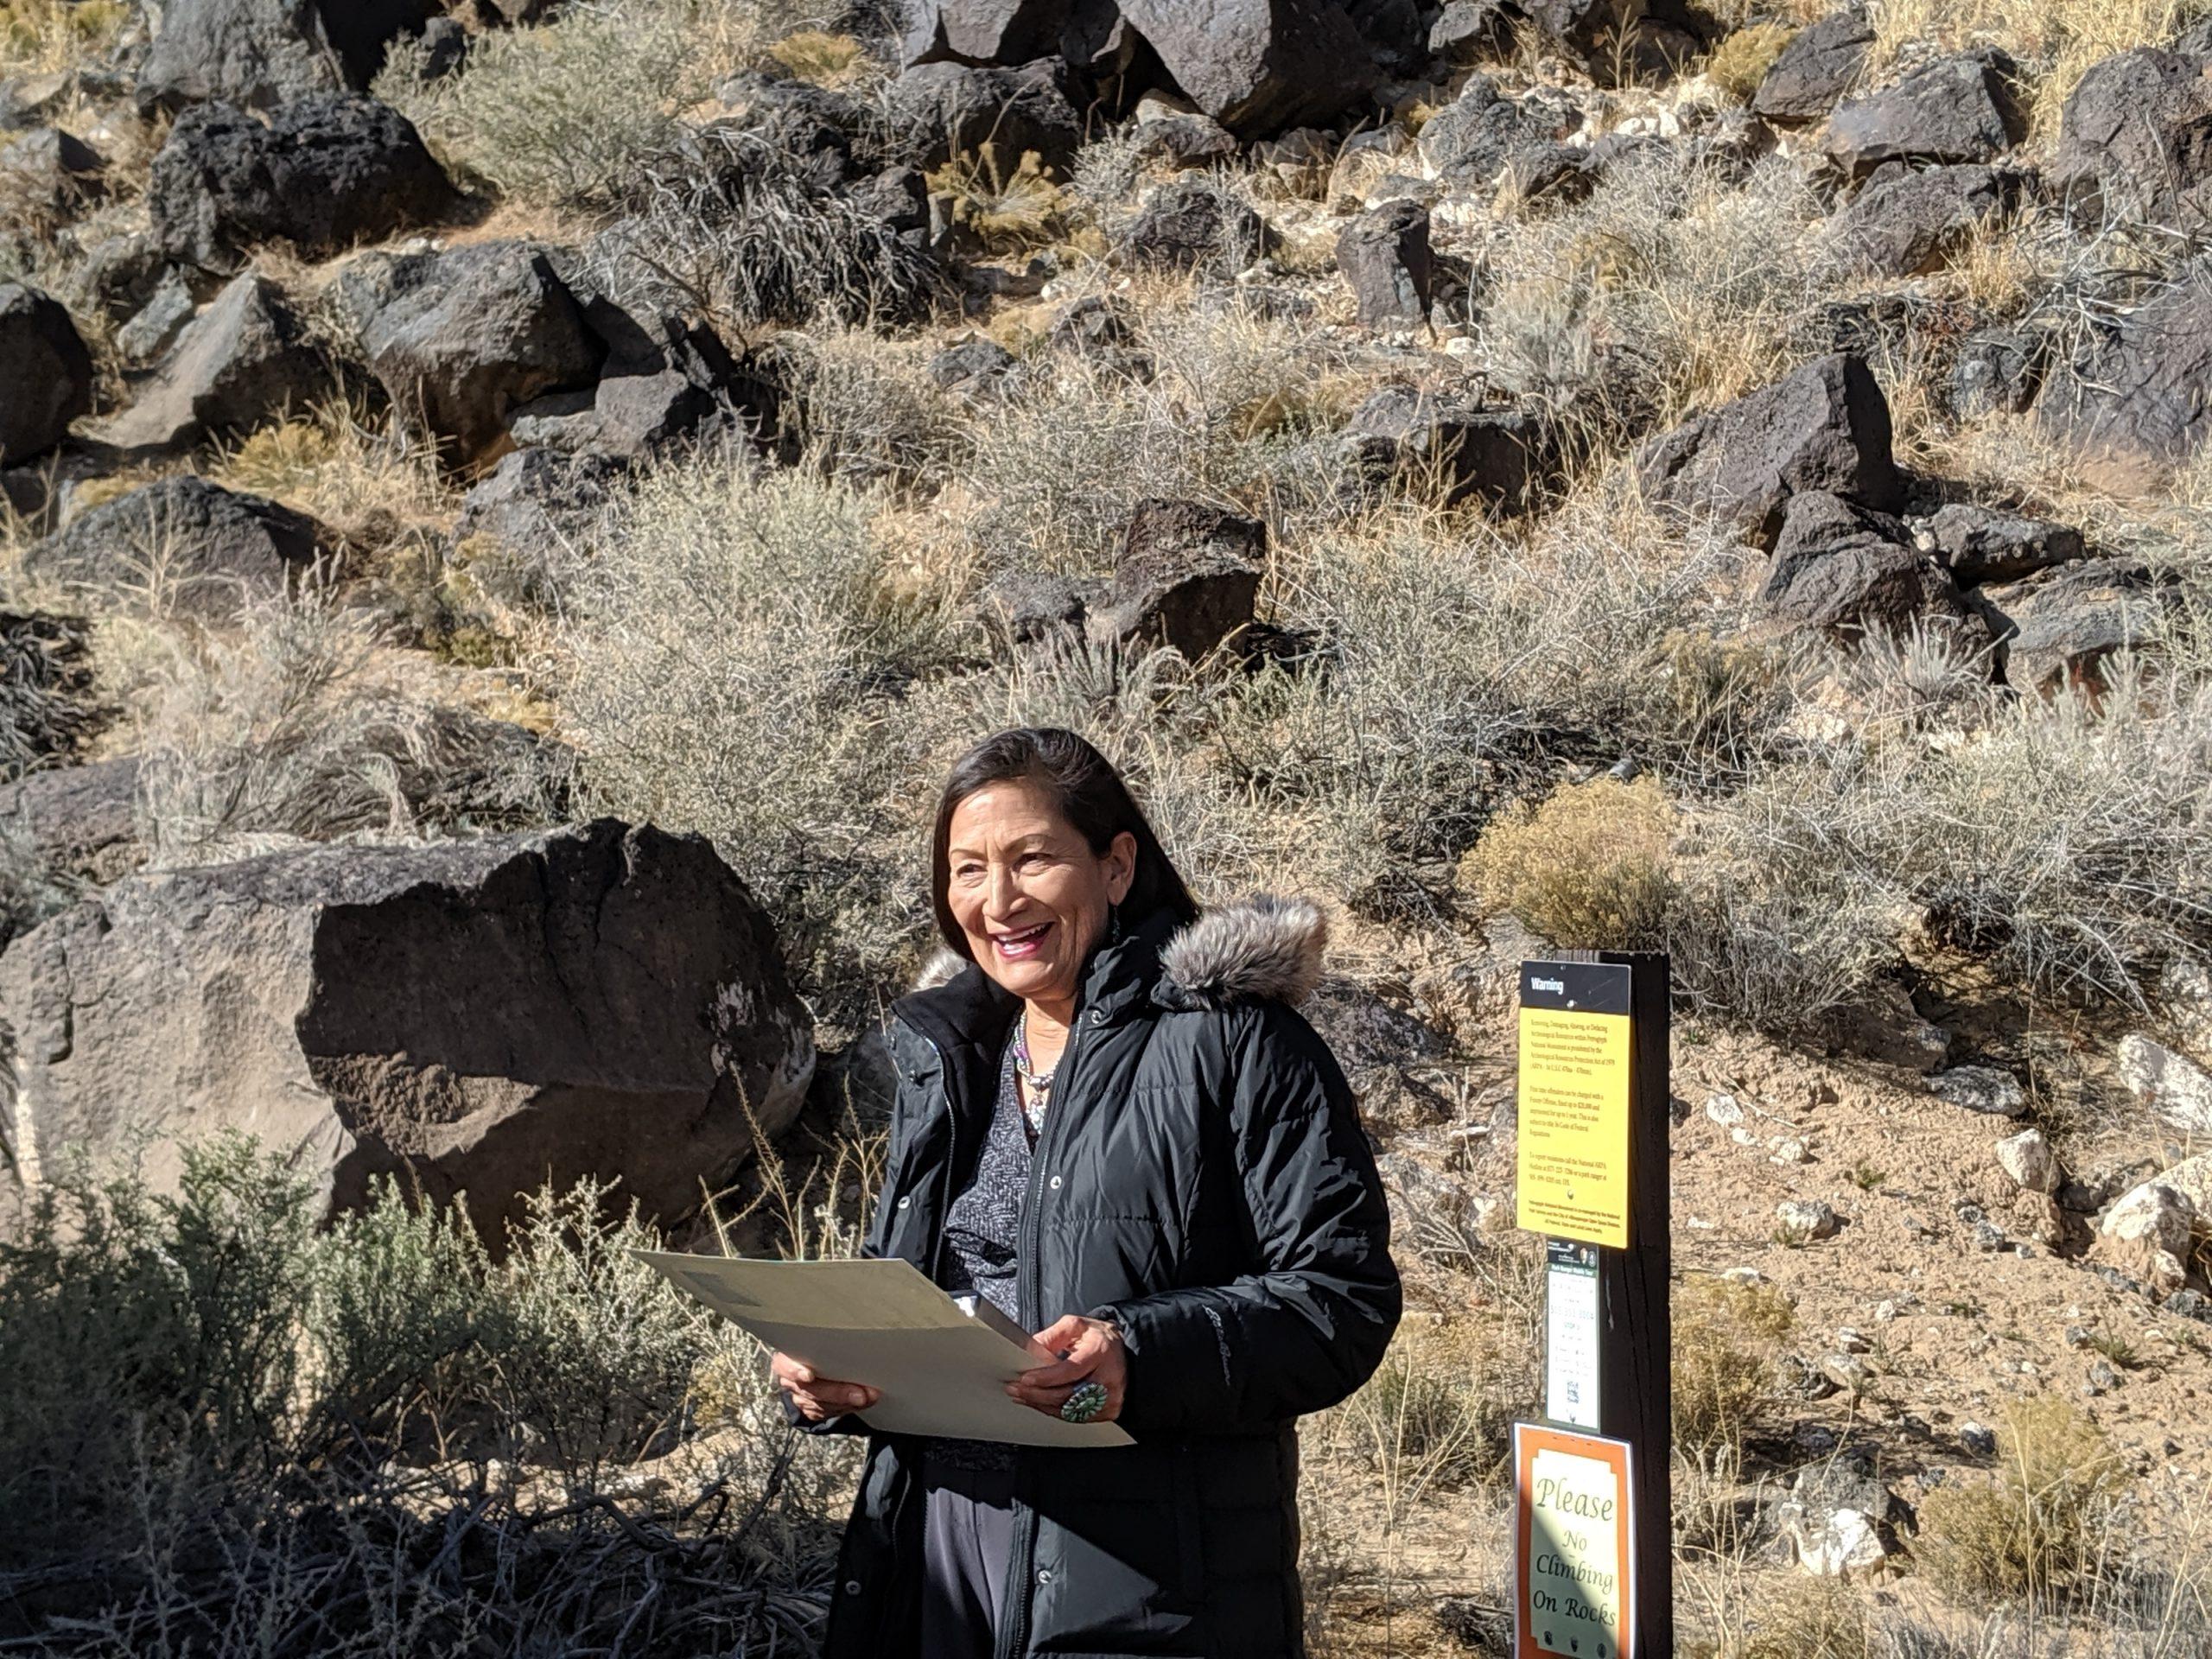 New Mexico Wild celebrates nomination of Congresswoman Deb Haaland to serve as Secretary of Interior